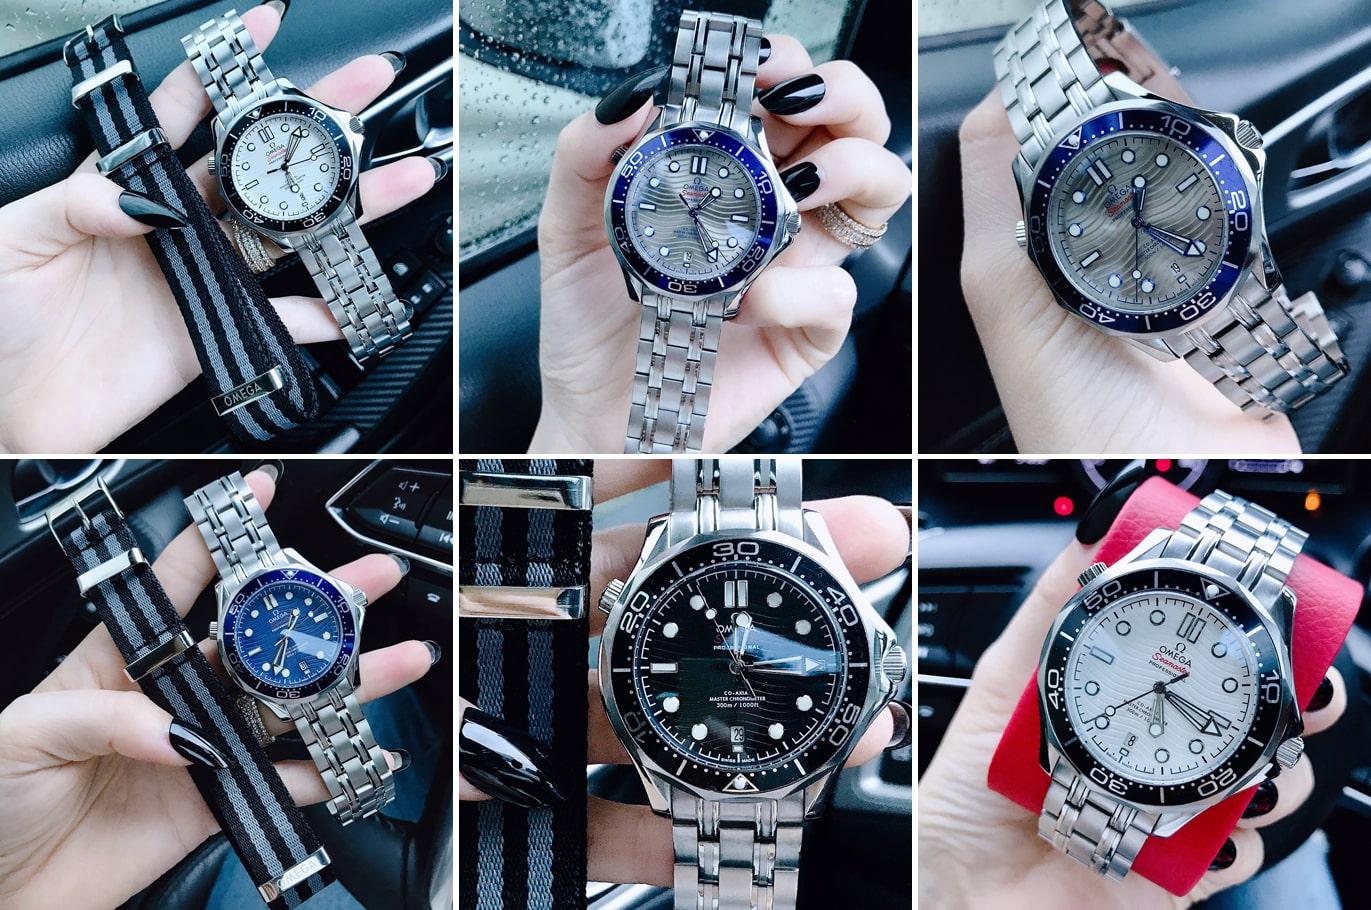 Hinh-anh-thuc-te-dong-ho-Omega-seamaster-Chronometer-1362200-vien-den